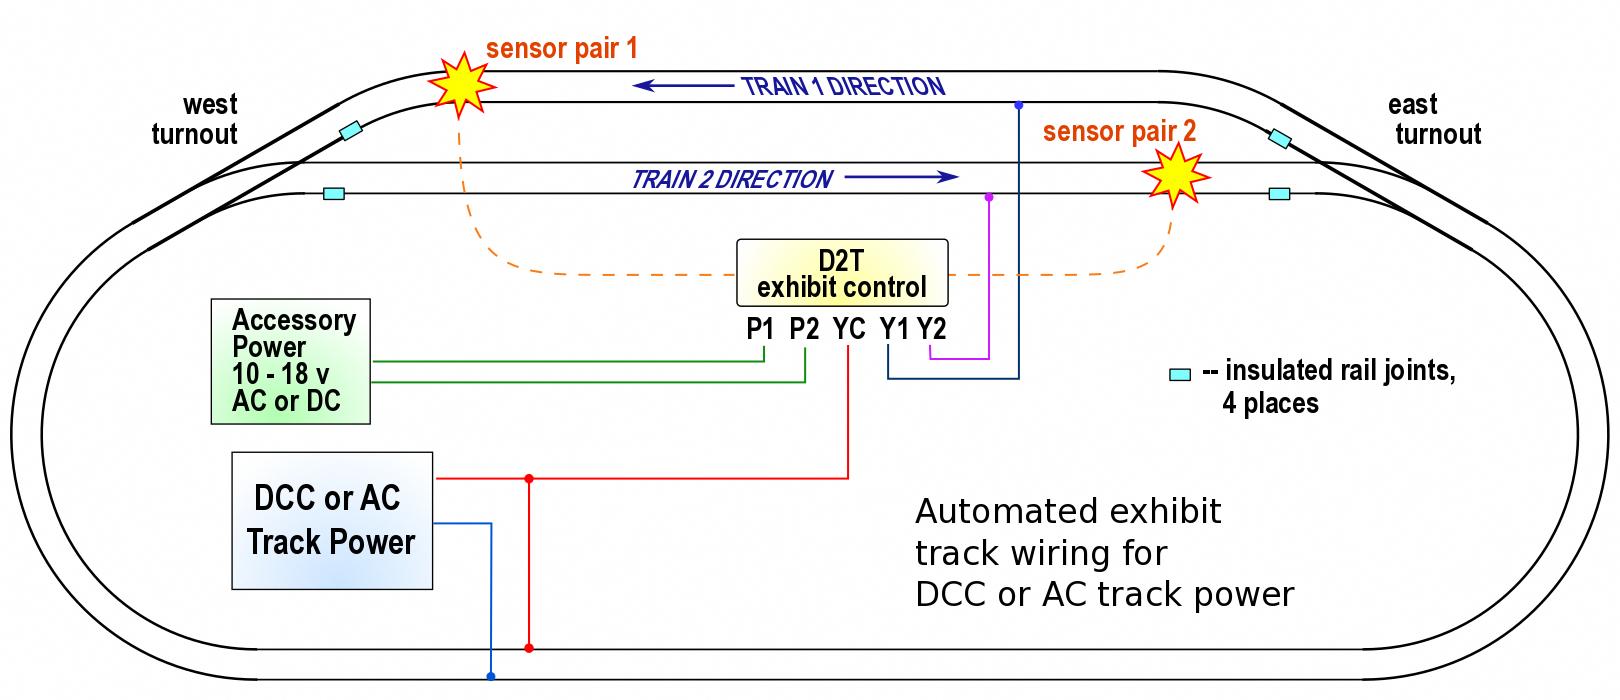 dcc model railway wiring diagrams sterling truck track vn davidforlife de loop diagram for ac or modeltrainkits maqueta rh pinterest com ho scale